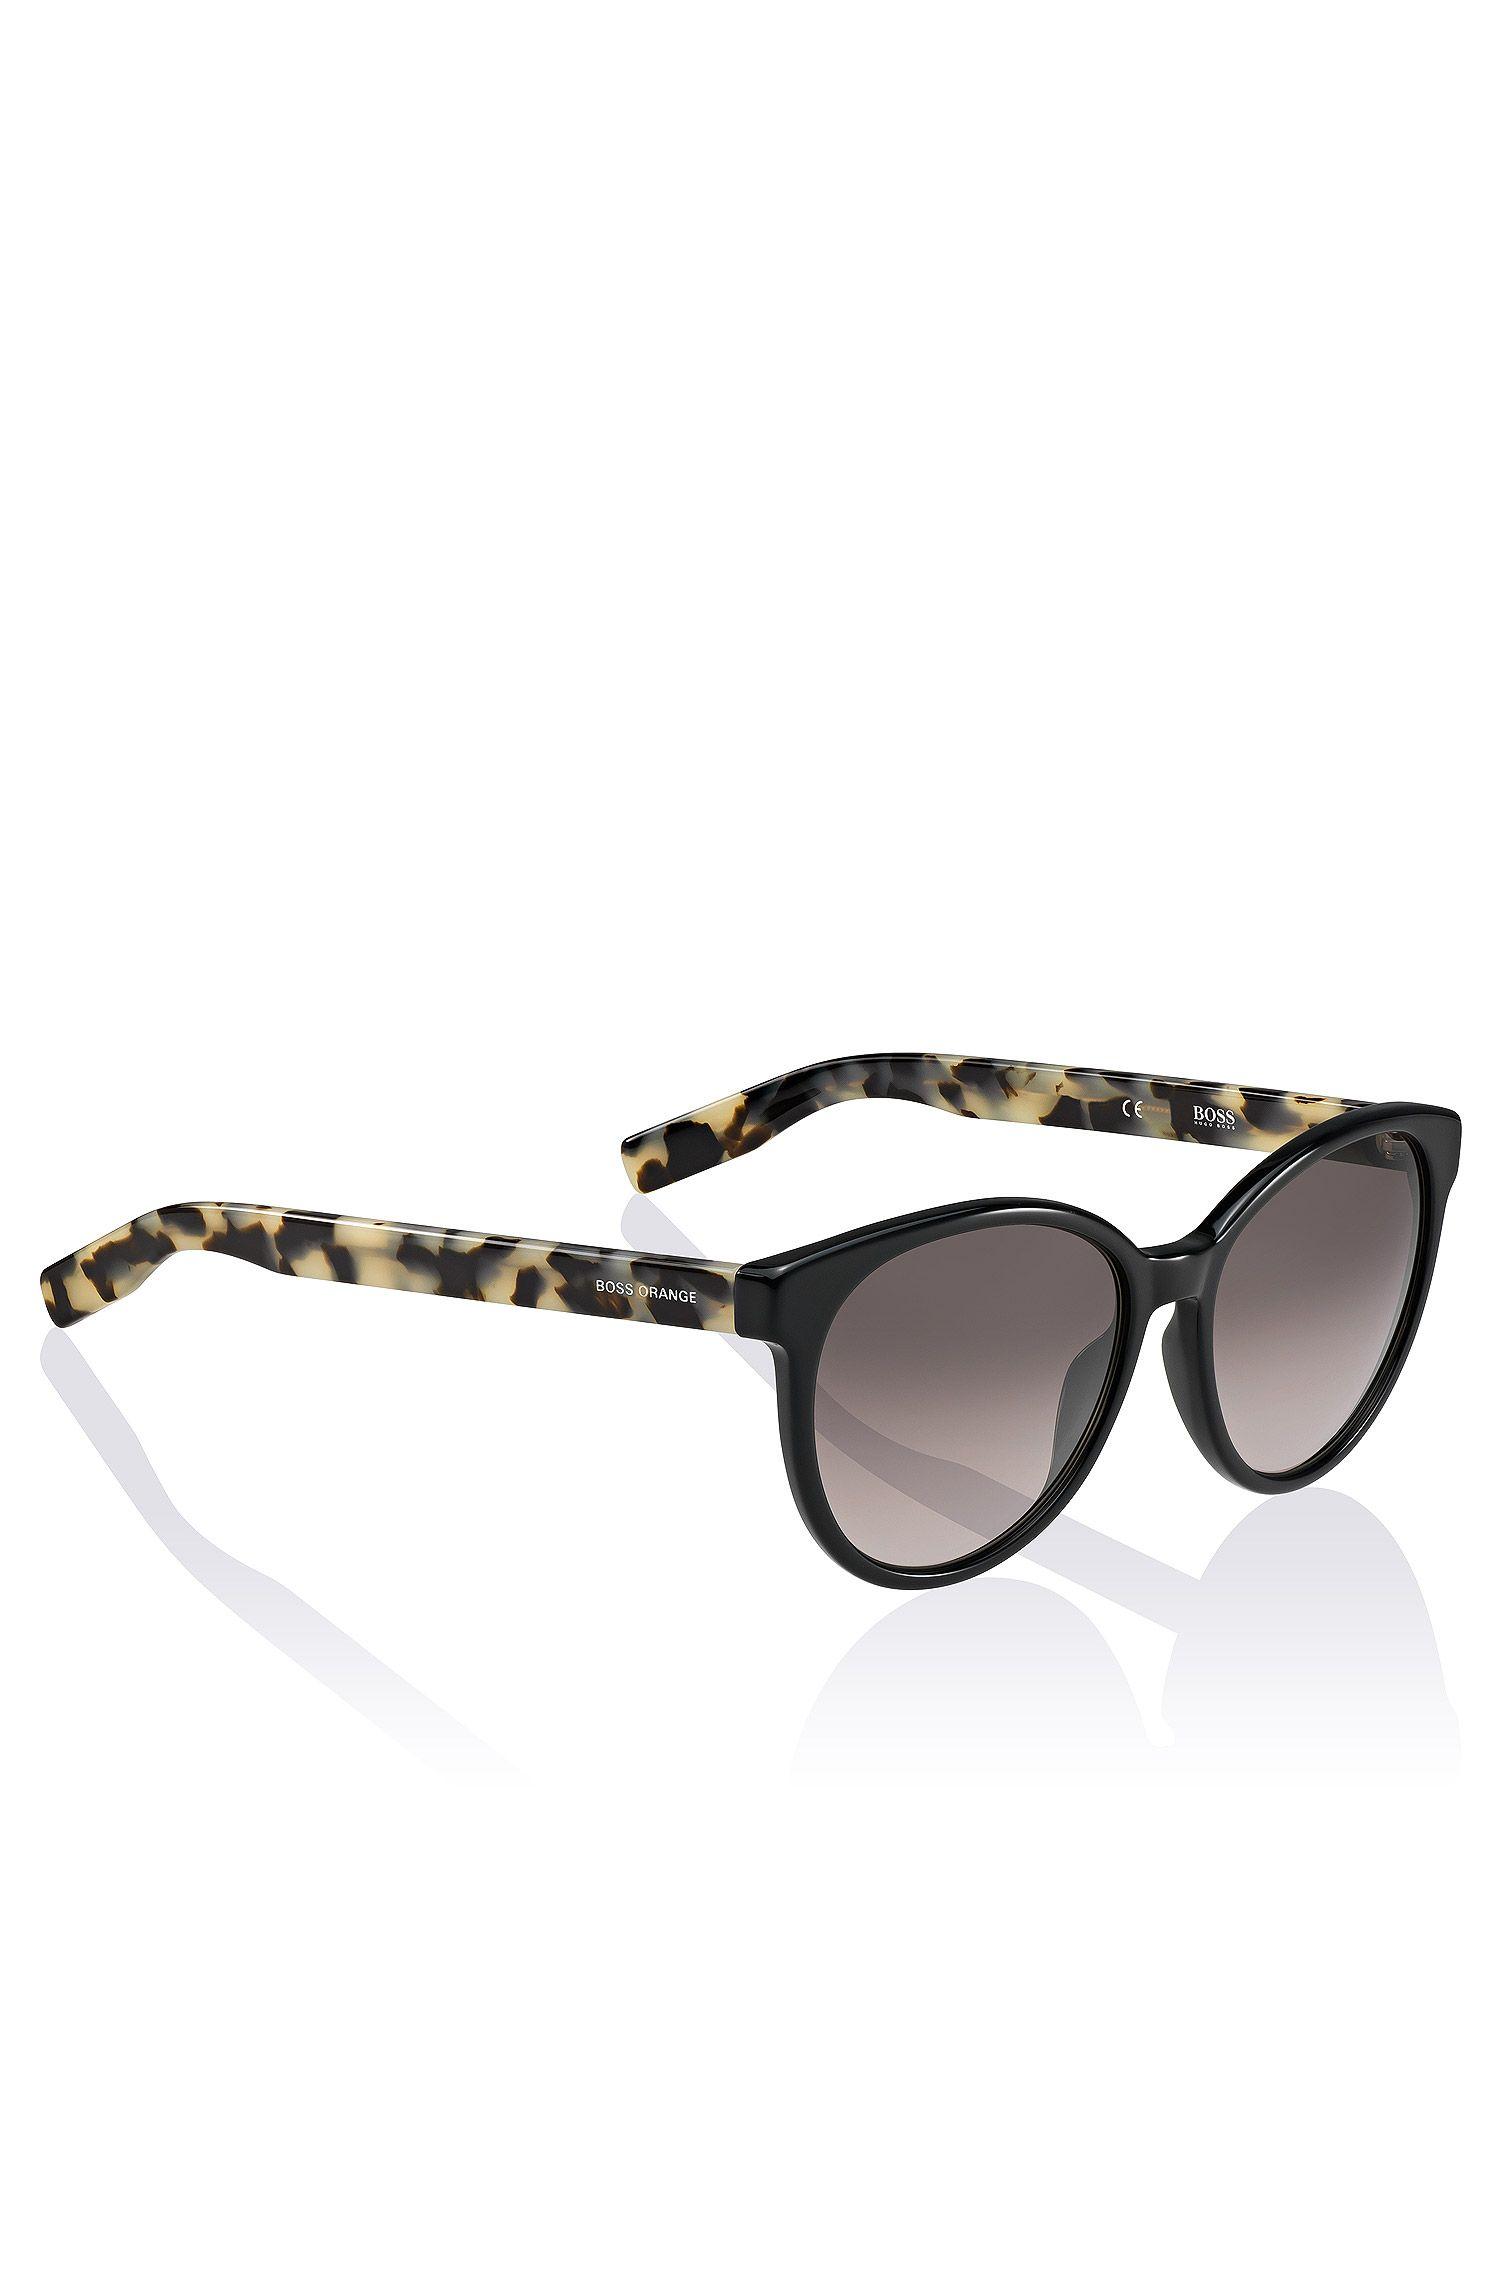 Sunglasses 'BO 0195'